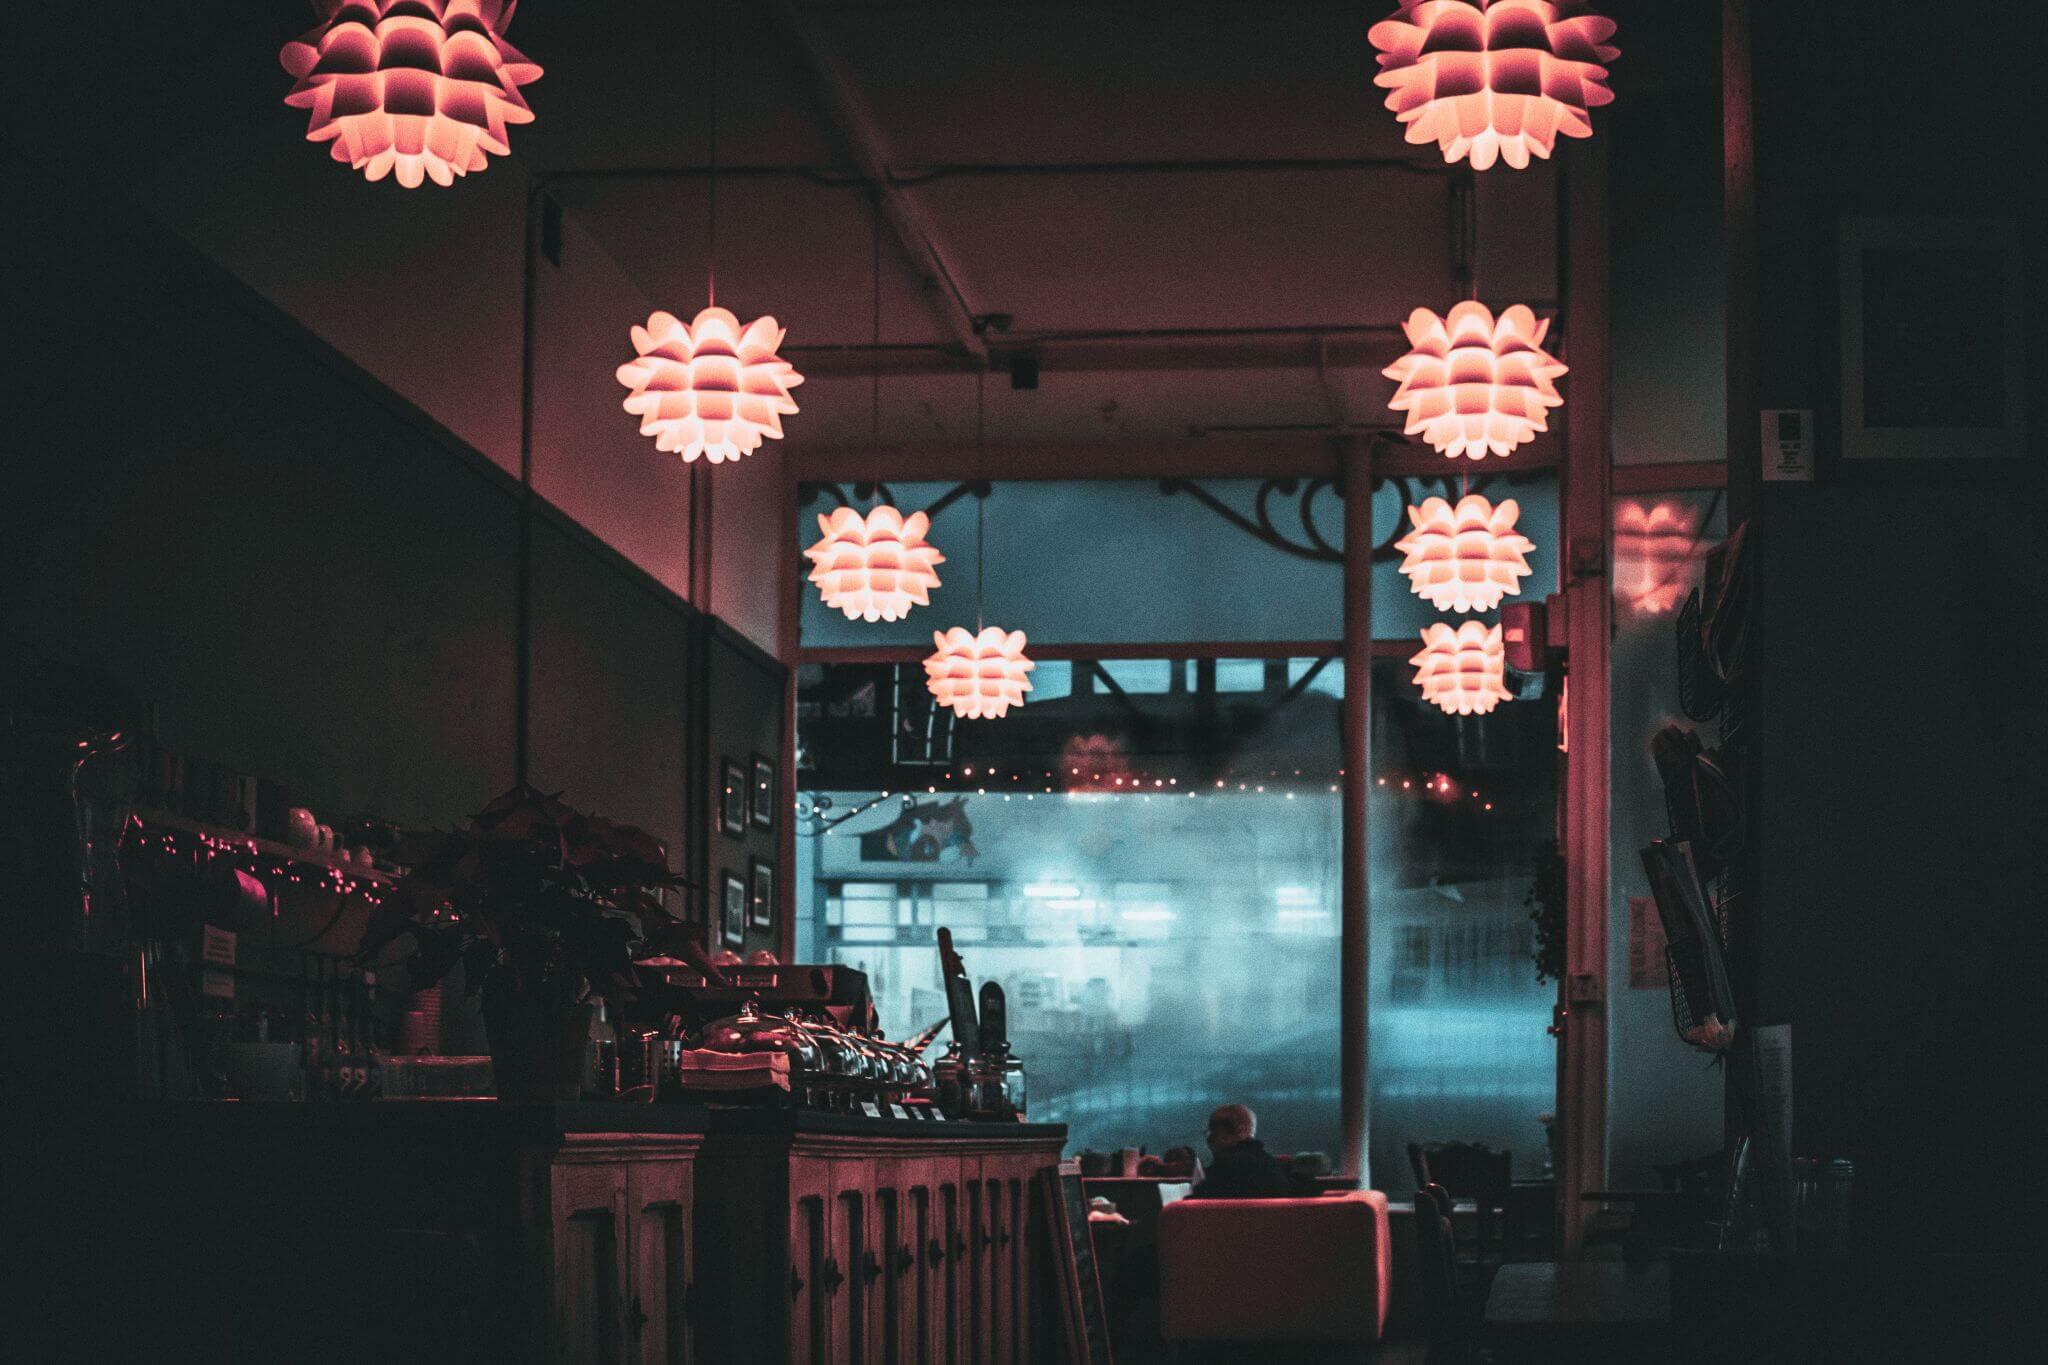 https://sleeklens.com/wp-content/uploads/2020/02/Night-Pub-After.jpg